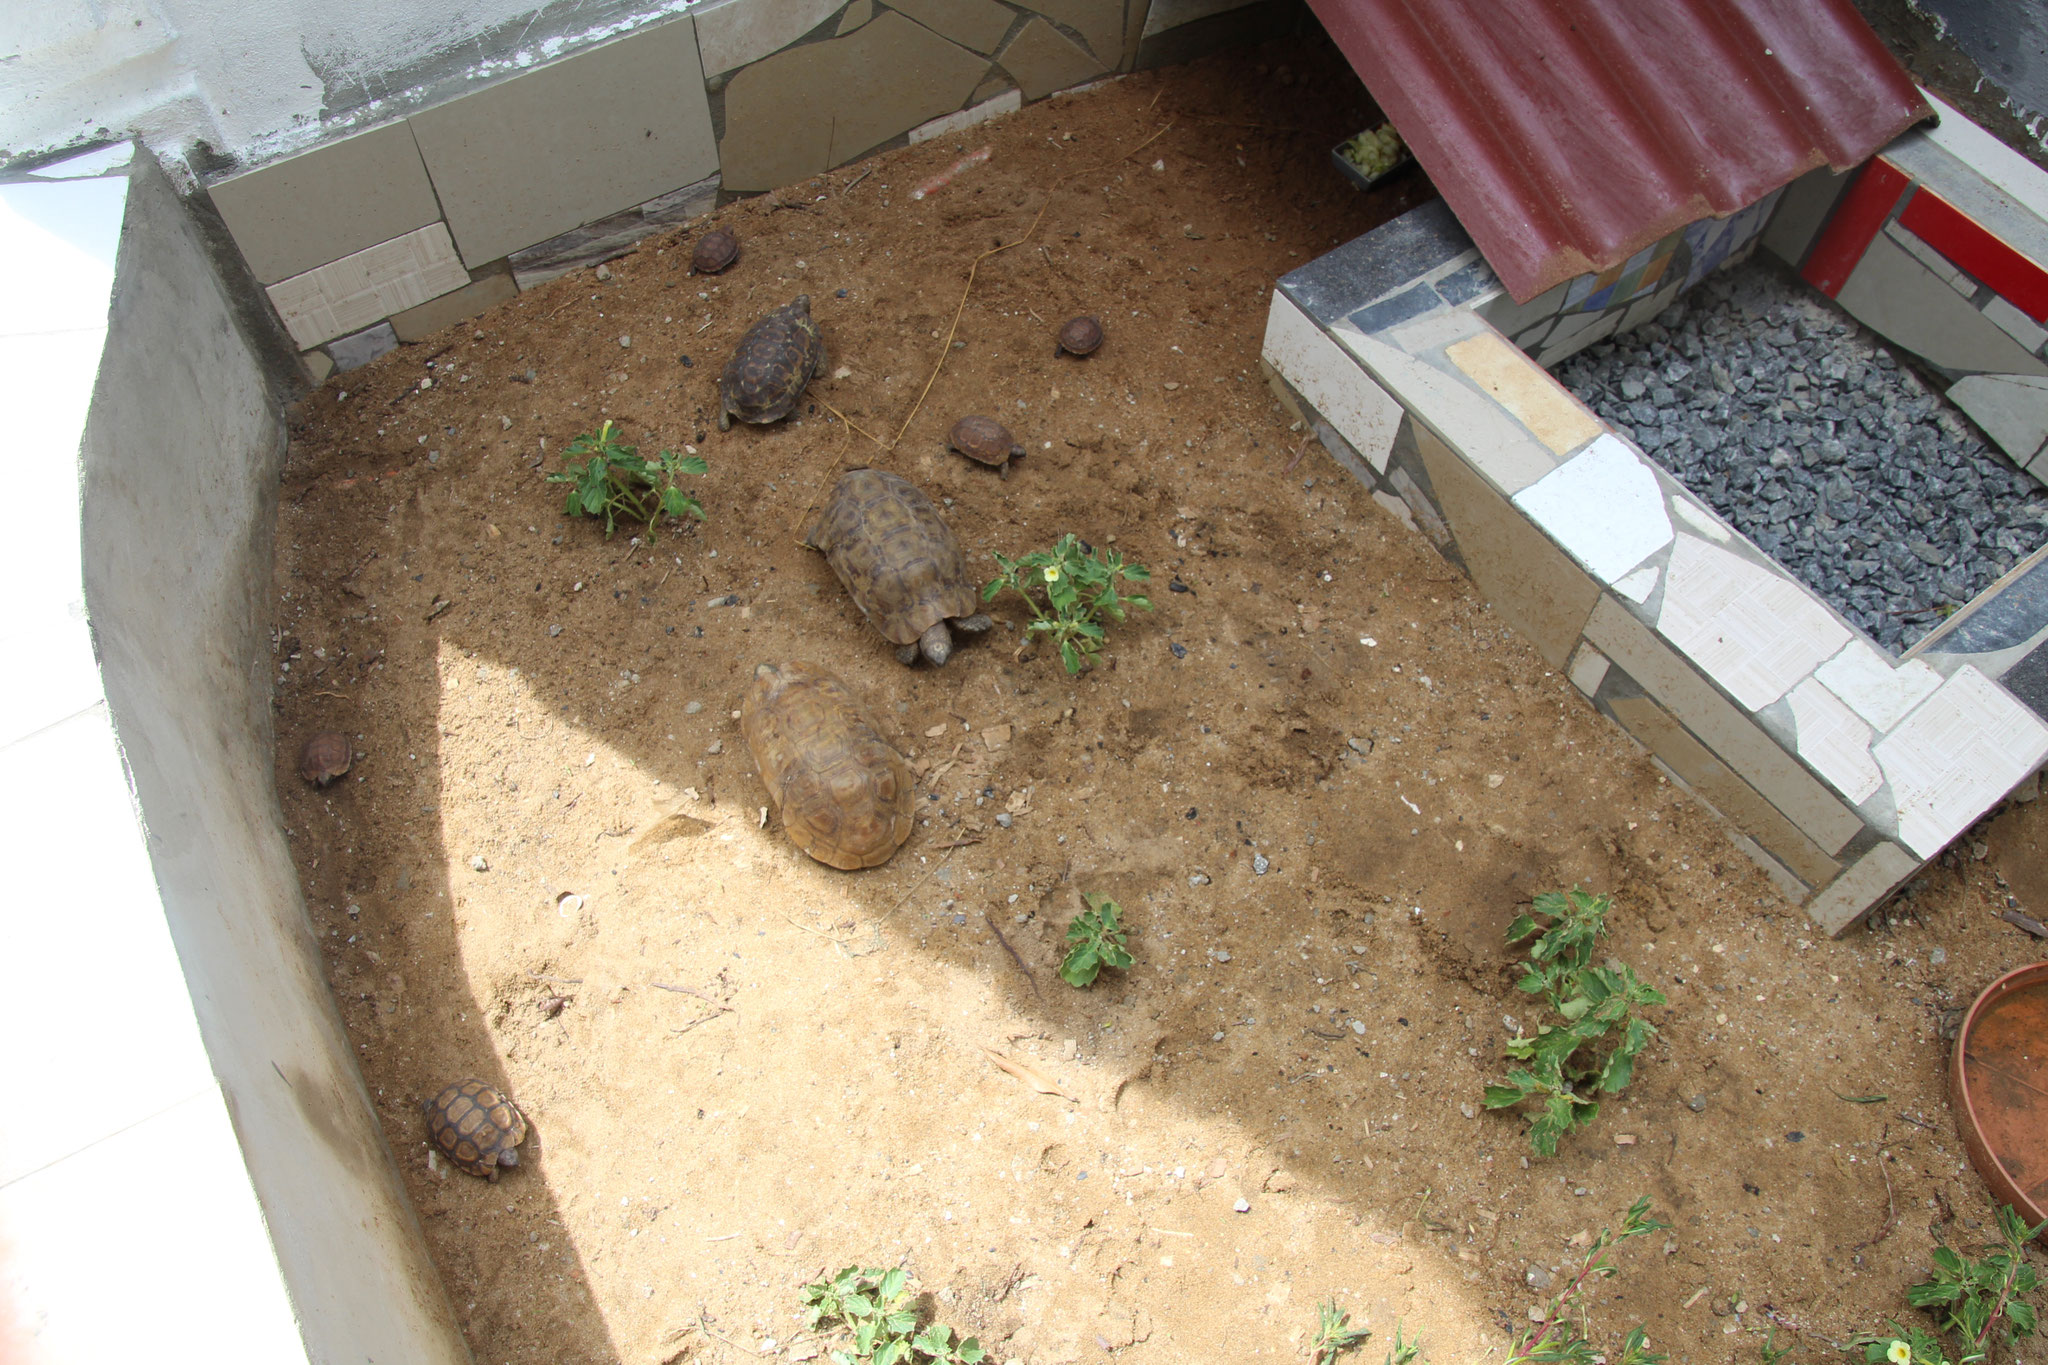 Unsere 8 Kignixuys Bellina Schildkröten.